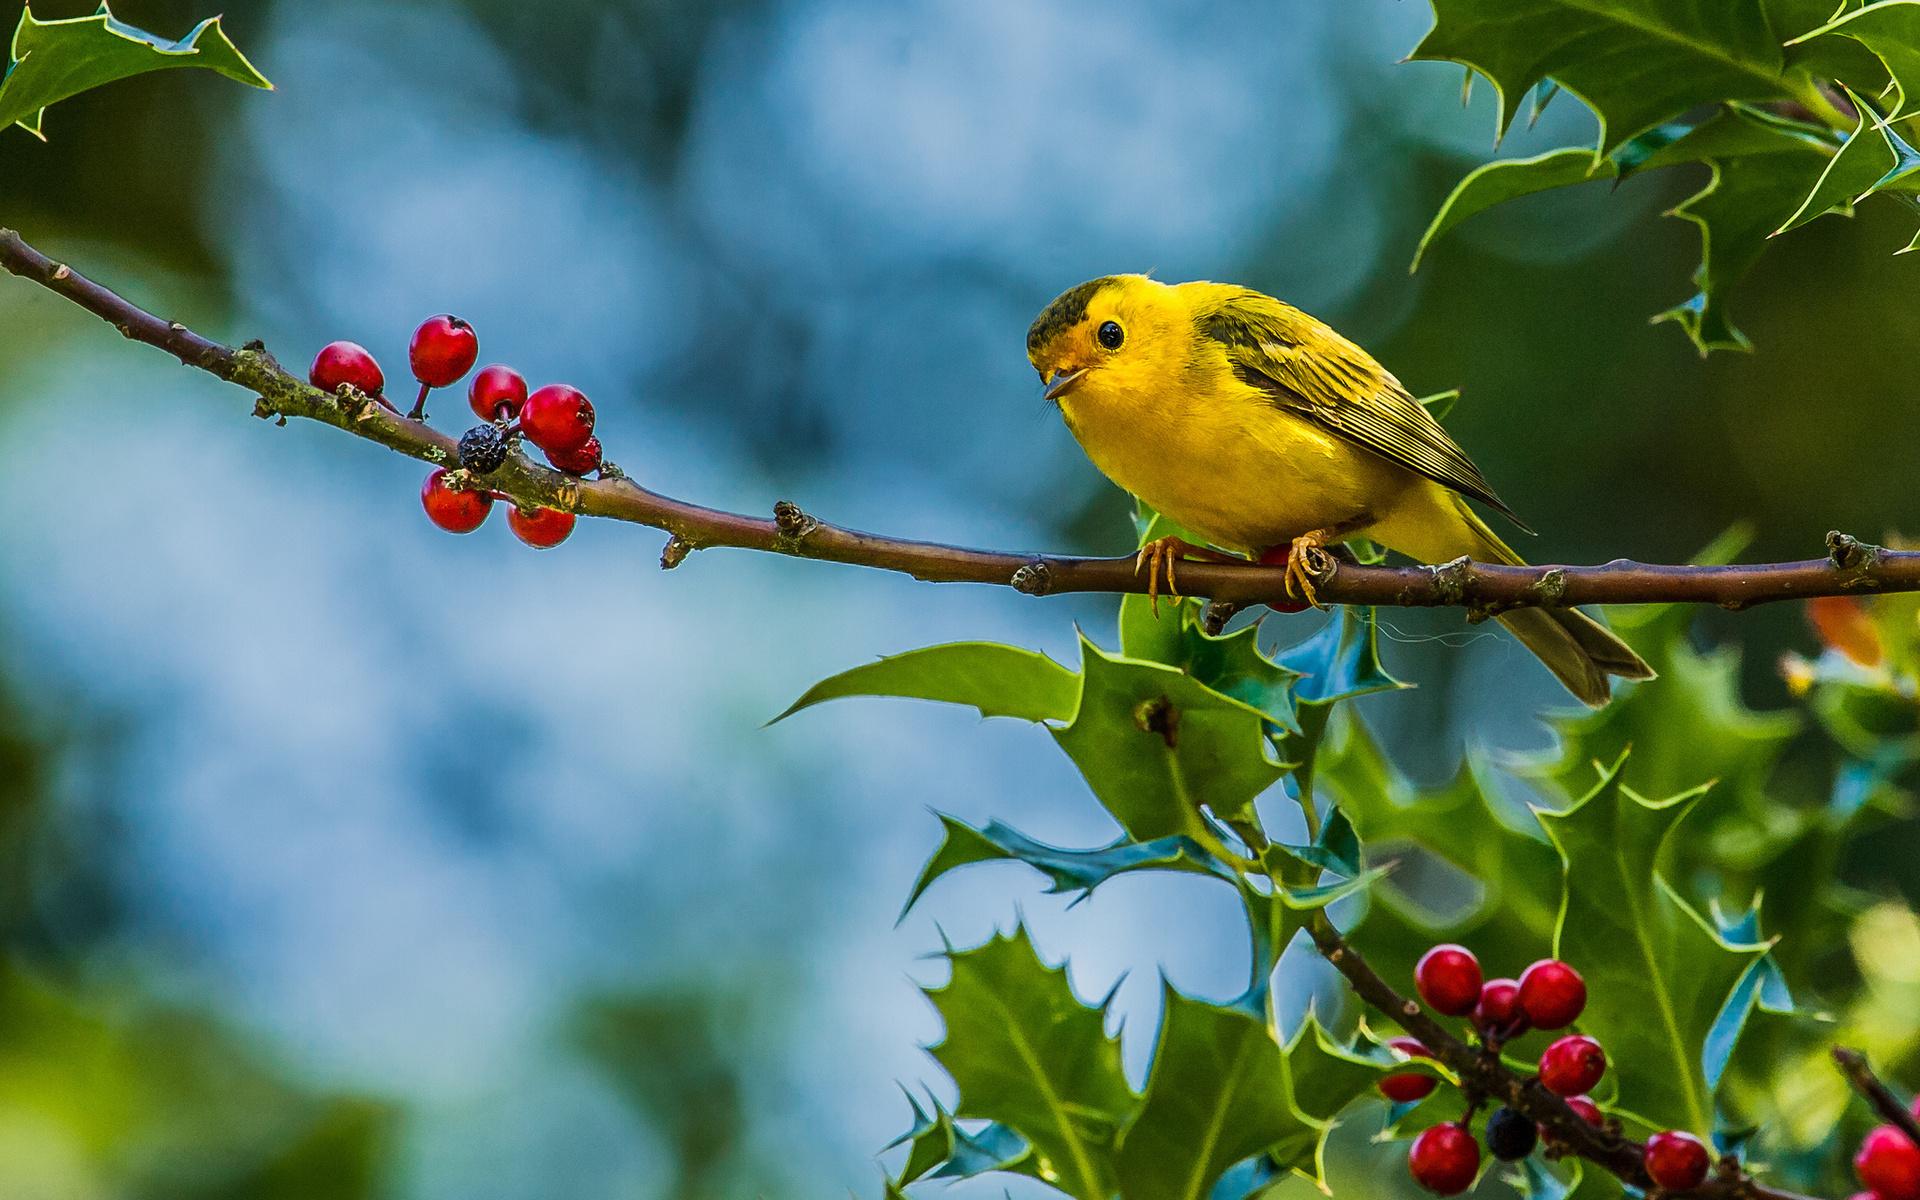 Cute bird wallpaper 19345 - Birds photo - Animal